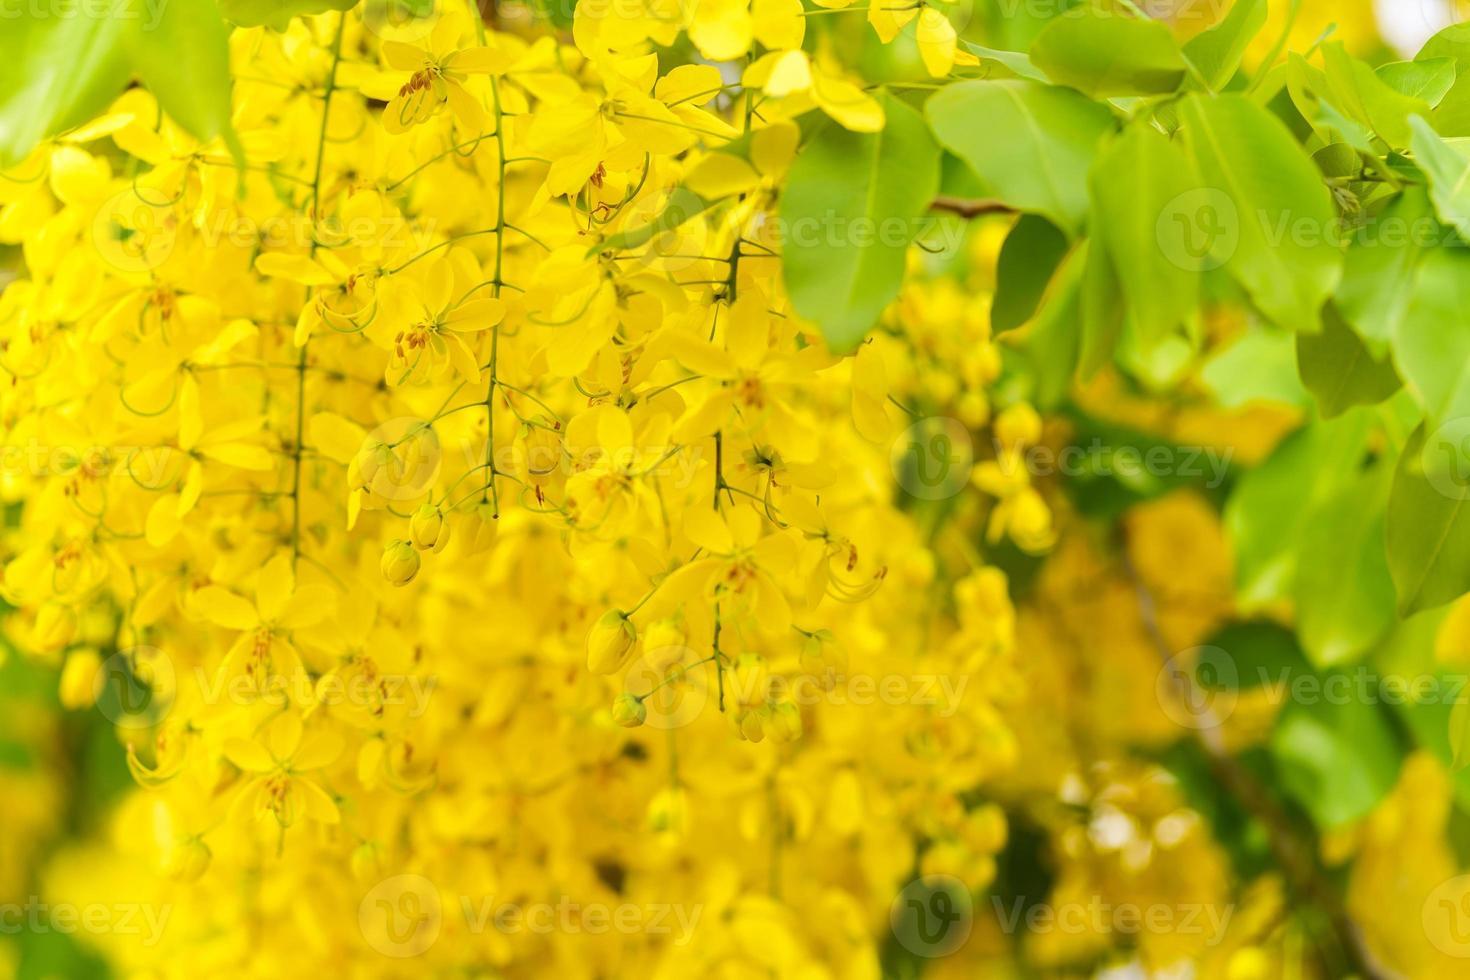 Golden Shower Tree, Yellow flowers background photo